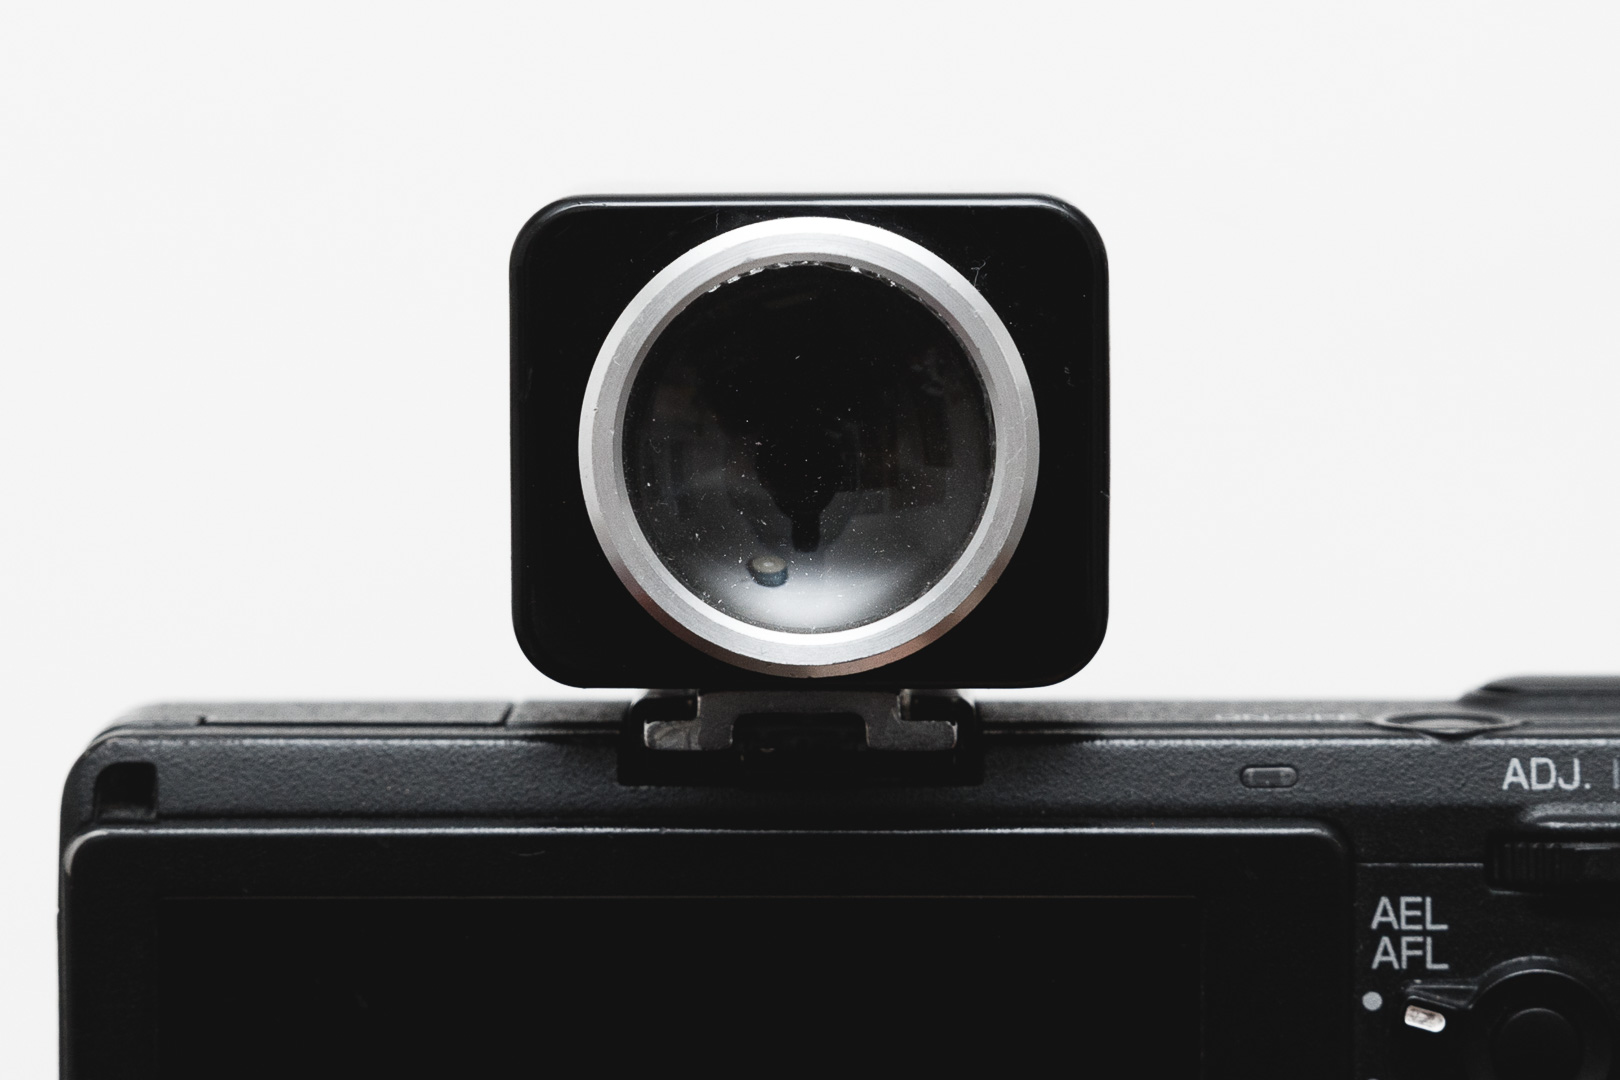 Voigtlander-50mm-Kontur-Finder-Ant Tran-20170402-2998.jpg